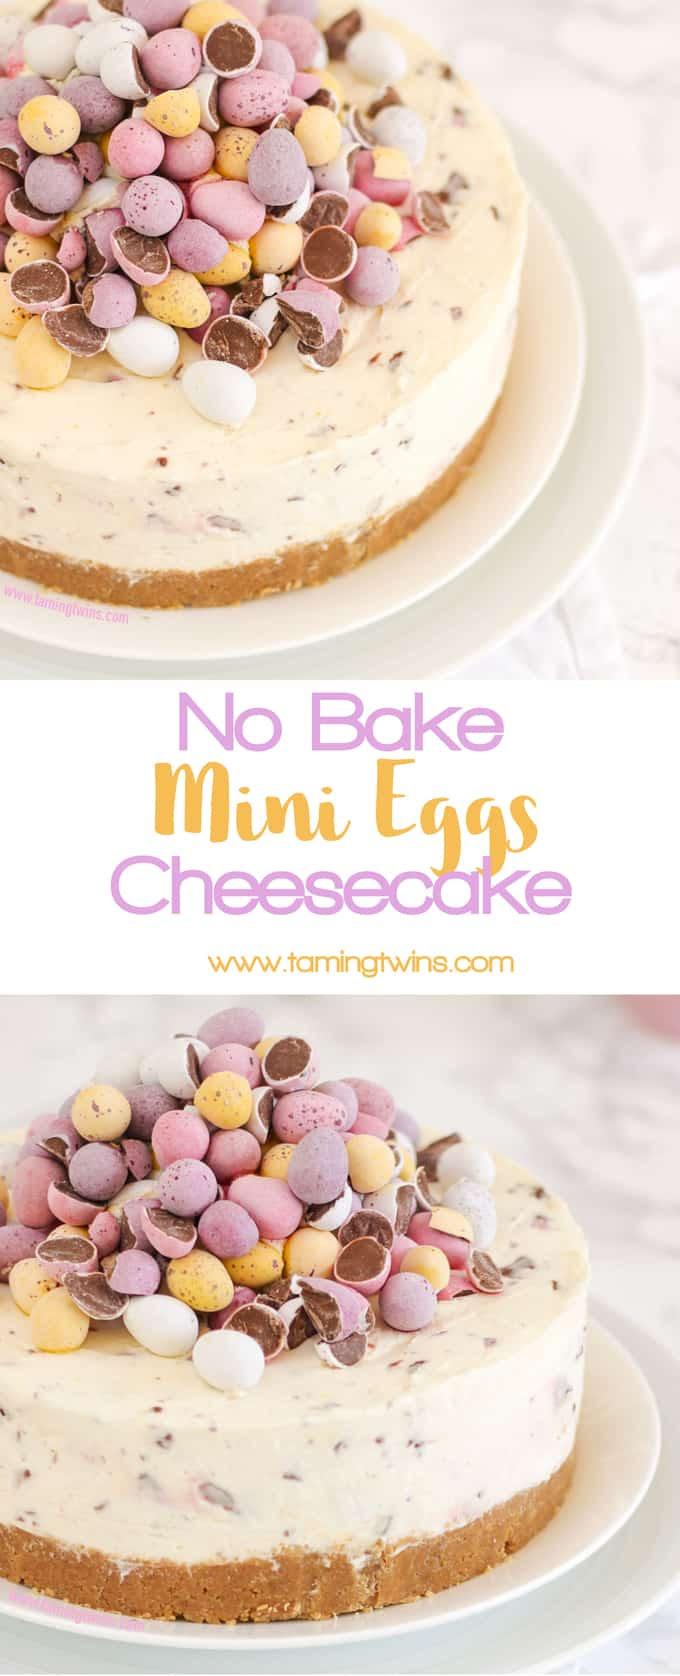 No Bake Mini Egg Cheesecake Recipe - Taming Twins